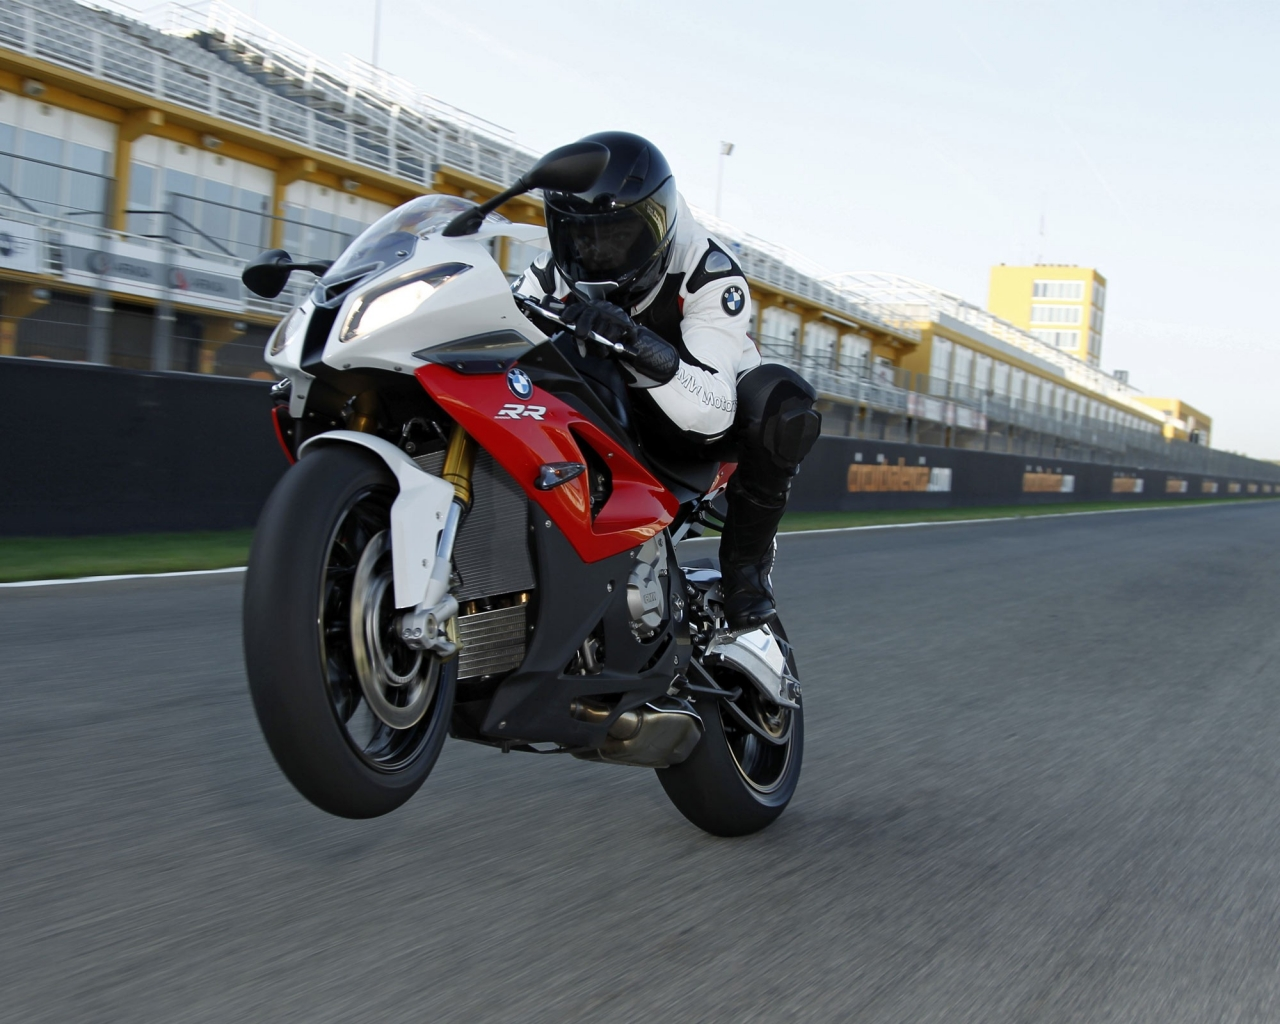 Motos Pisteras Ninja Hd 1280x1024: Moto Ninja BMW Hd 1280x1024